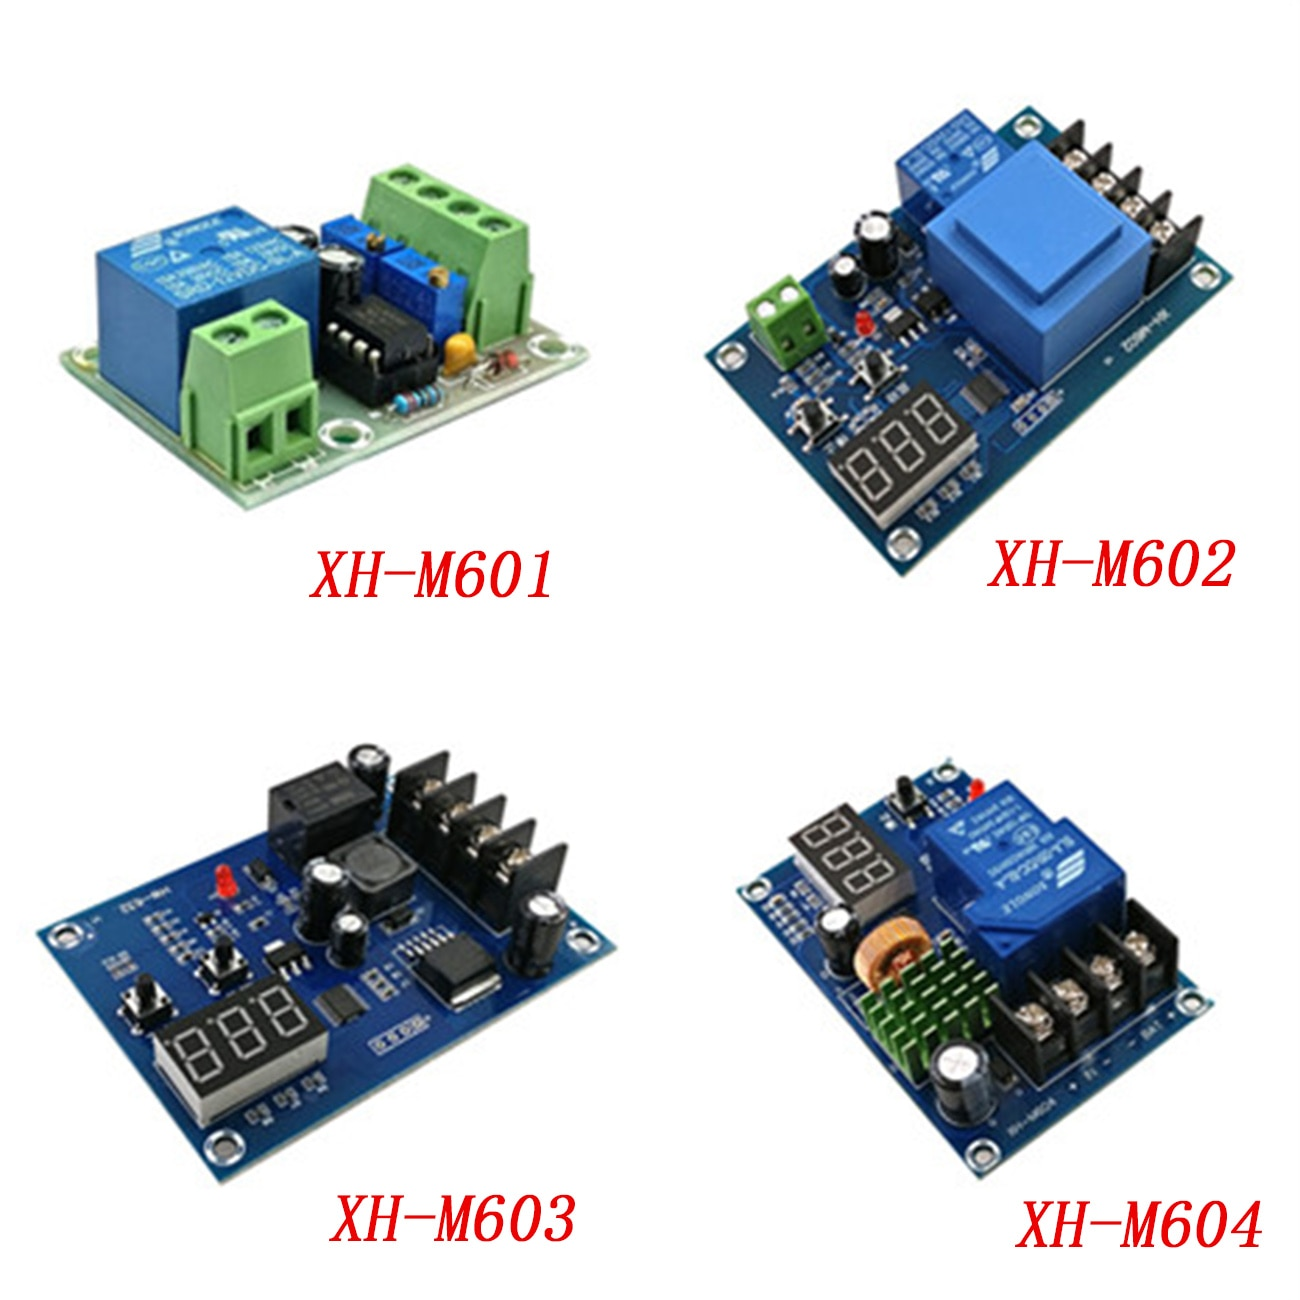 XH-M601 XH-M602 XH-M603 XH-M604 Lithium Battery Charging Protection Board Switch Controller Module DC 12V 3.7-120V 24V 6-60V